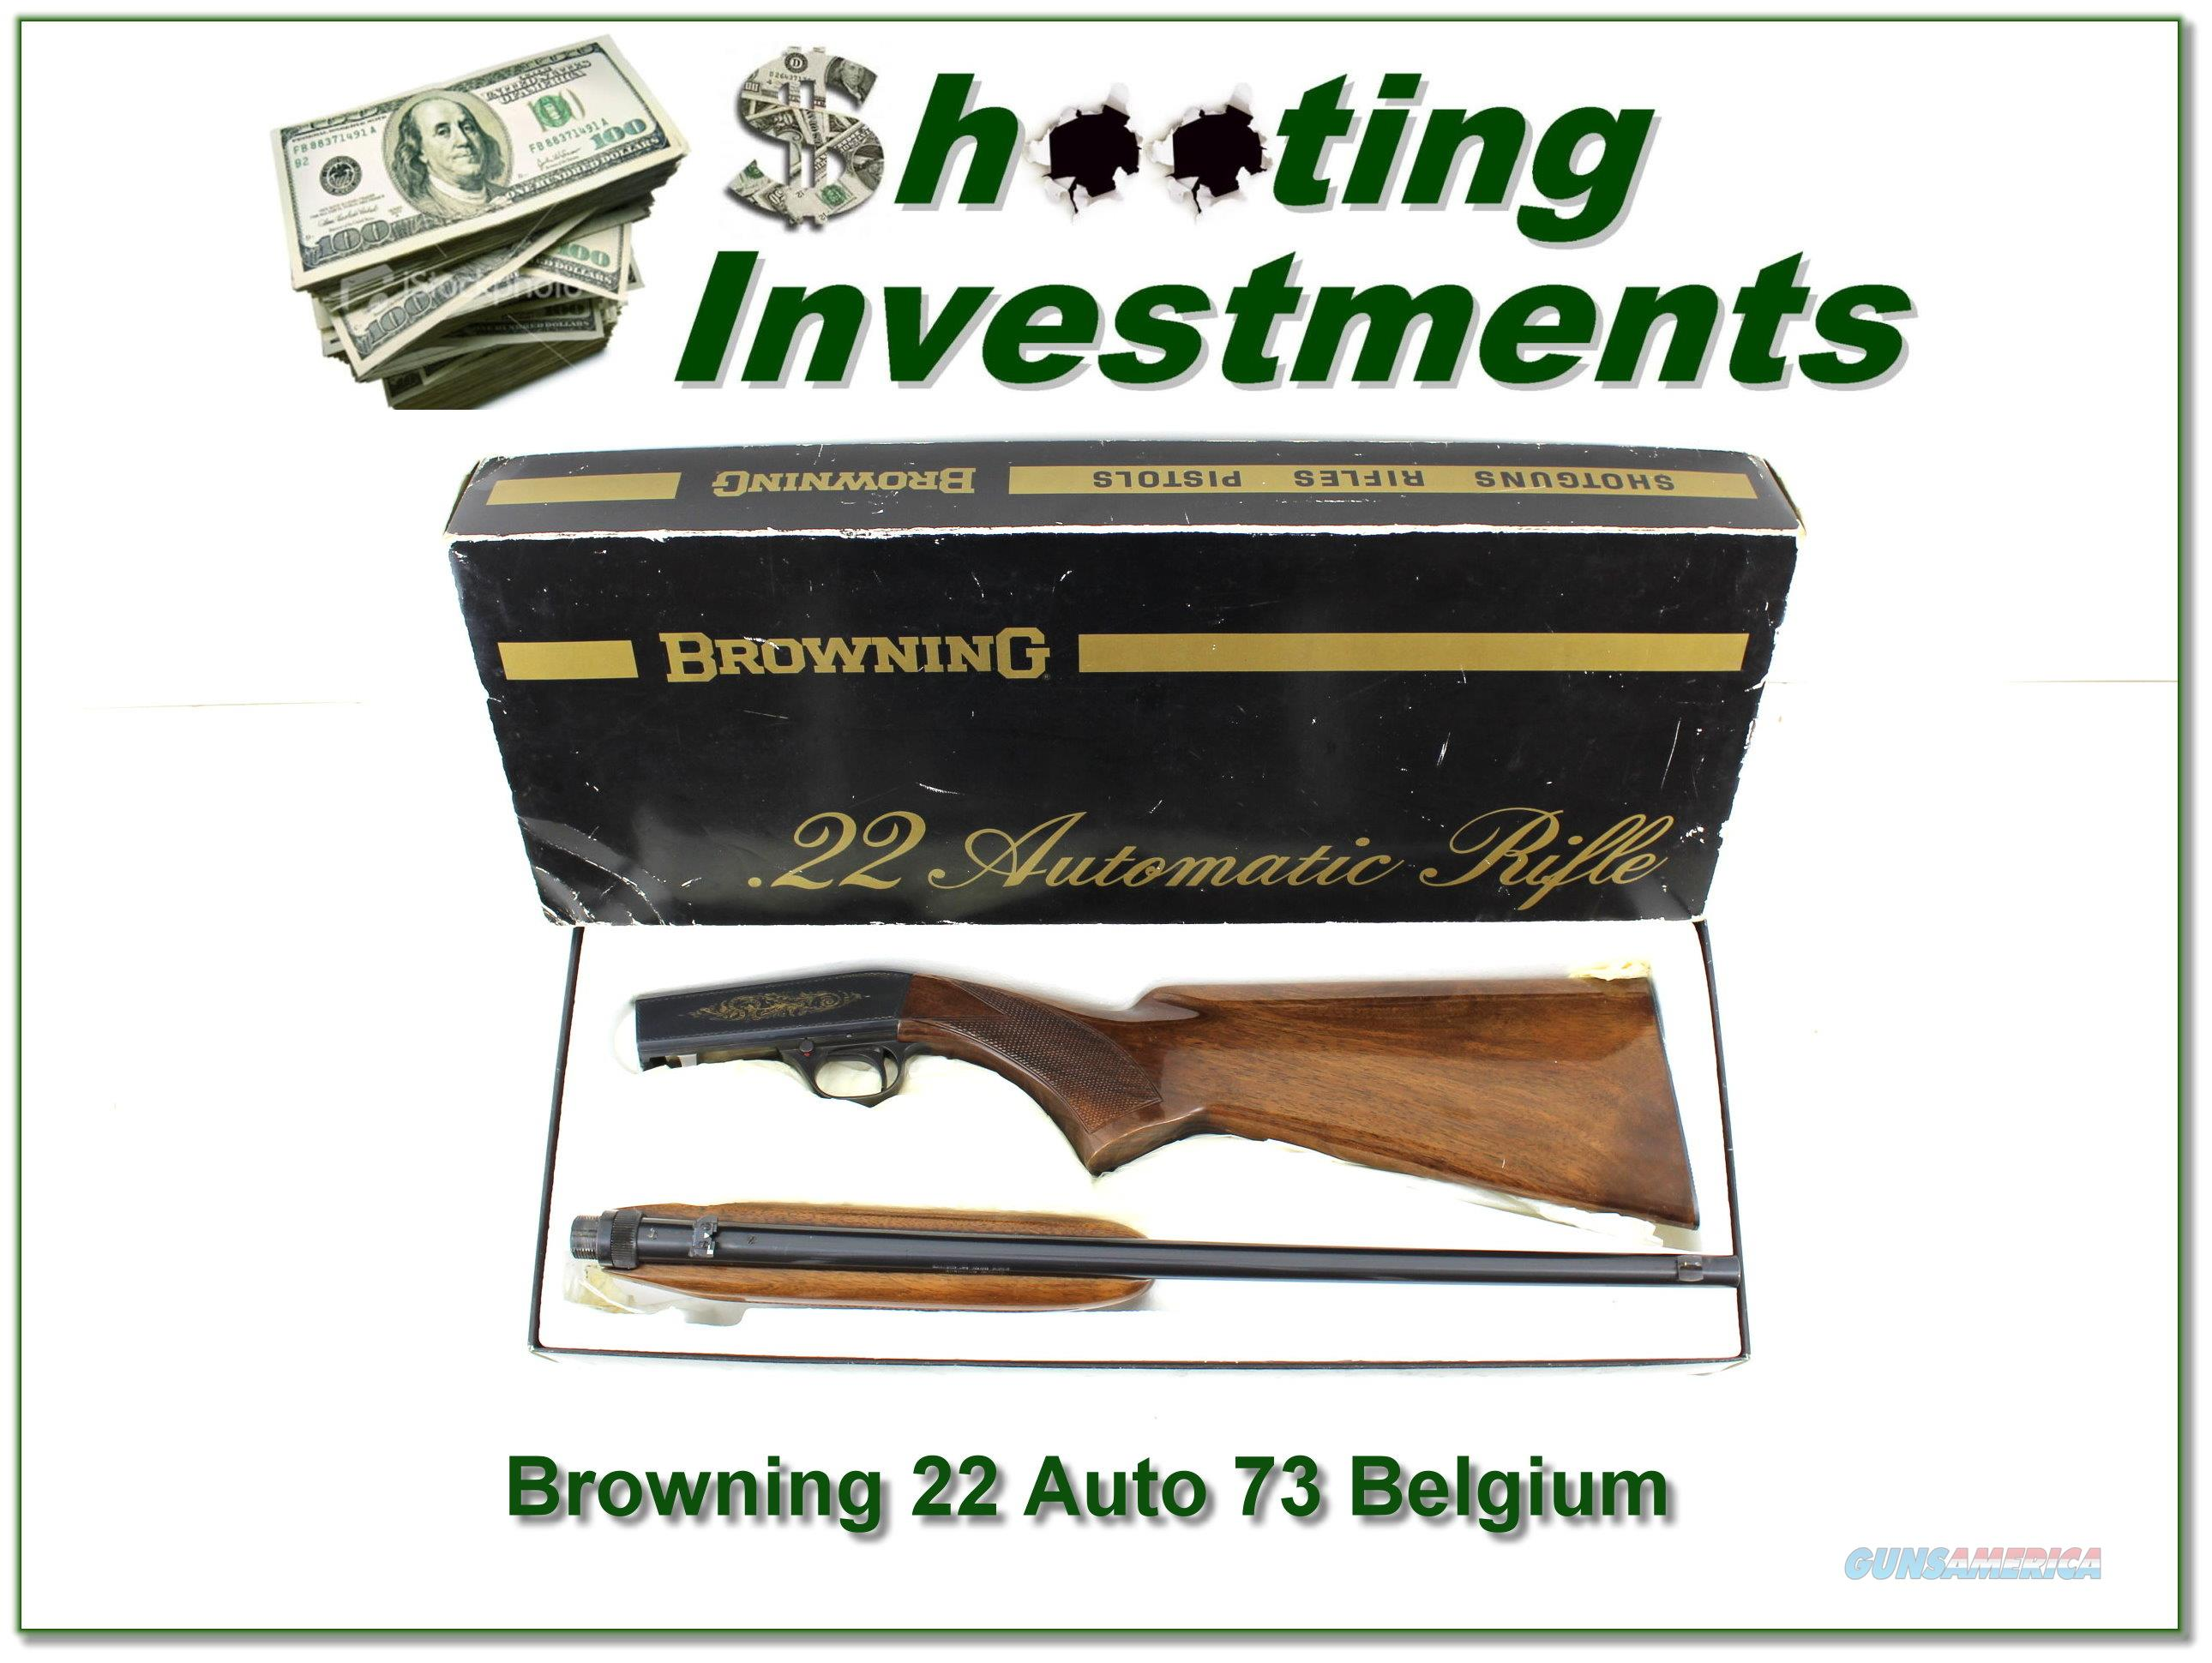 1973 Belgium Browning 22 Auto ANIB!  Guns > Rifles > Browning Rifles > Semi Auto > Hunting